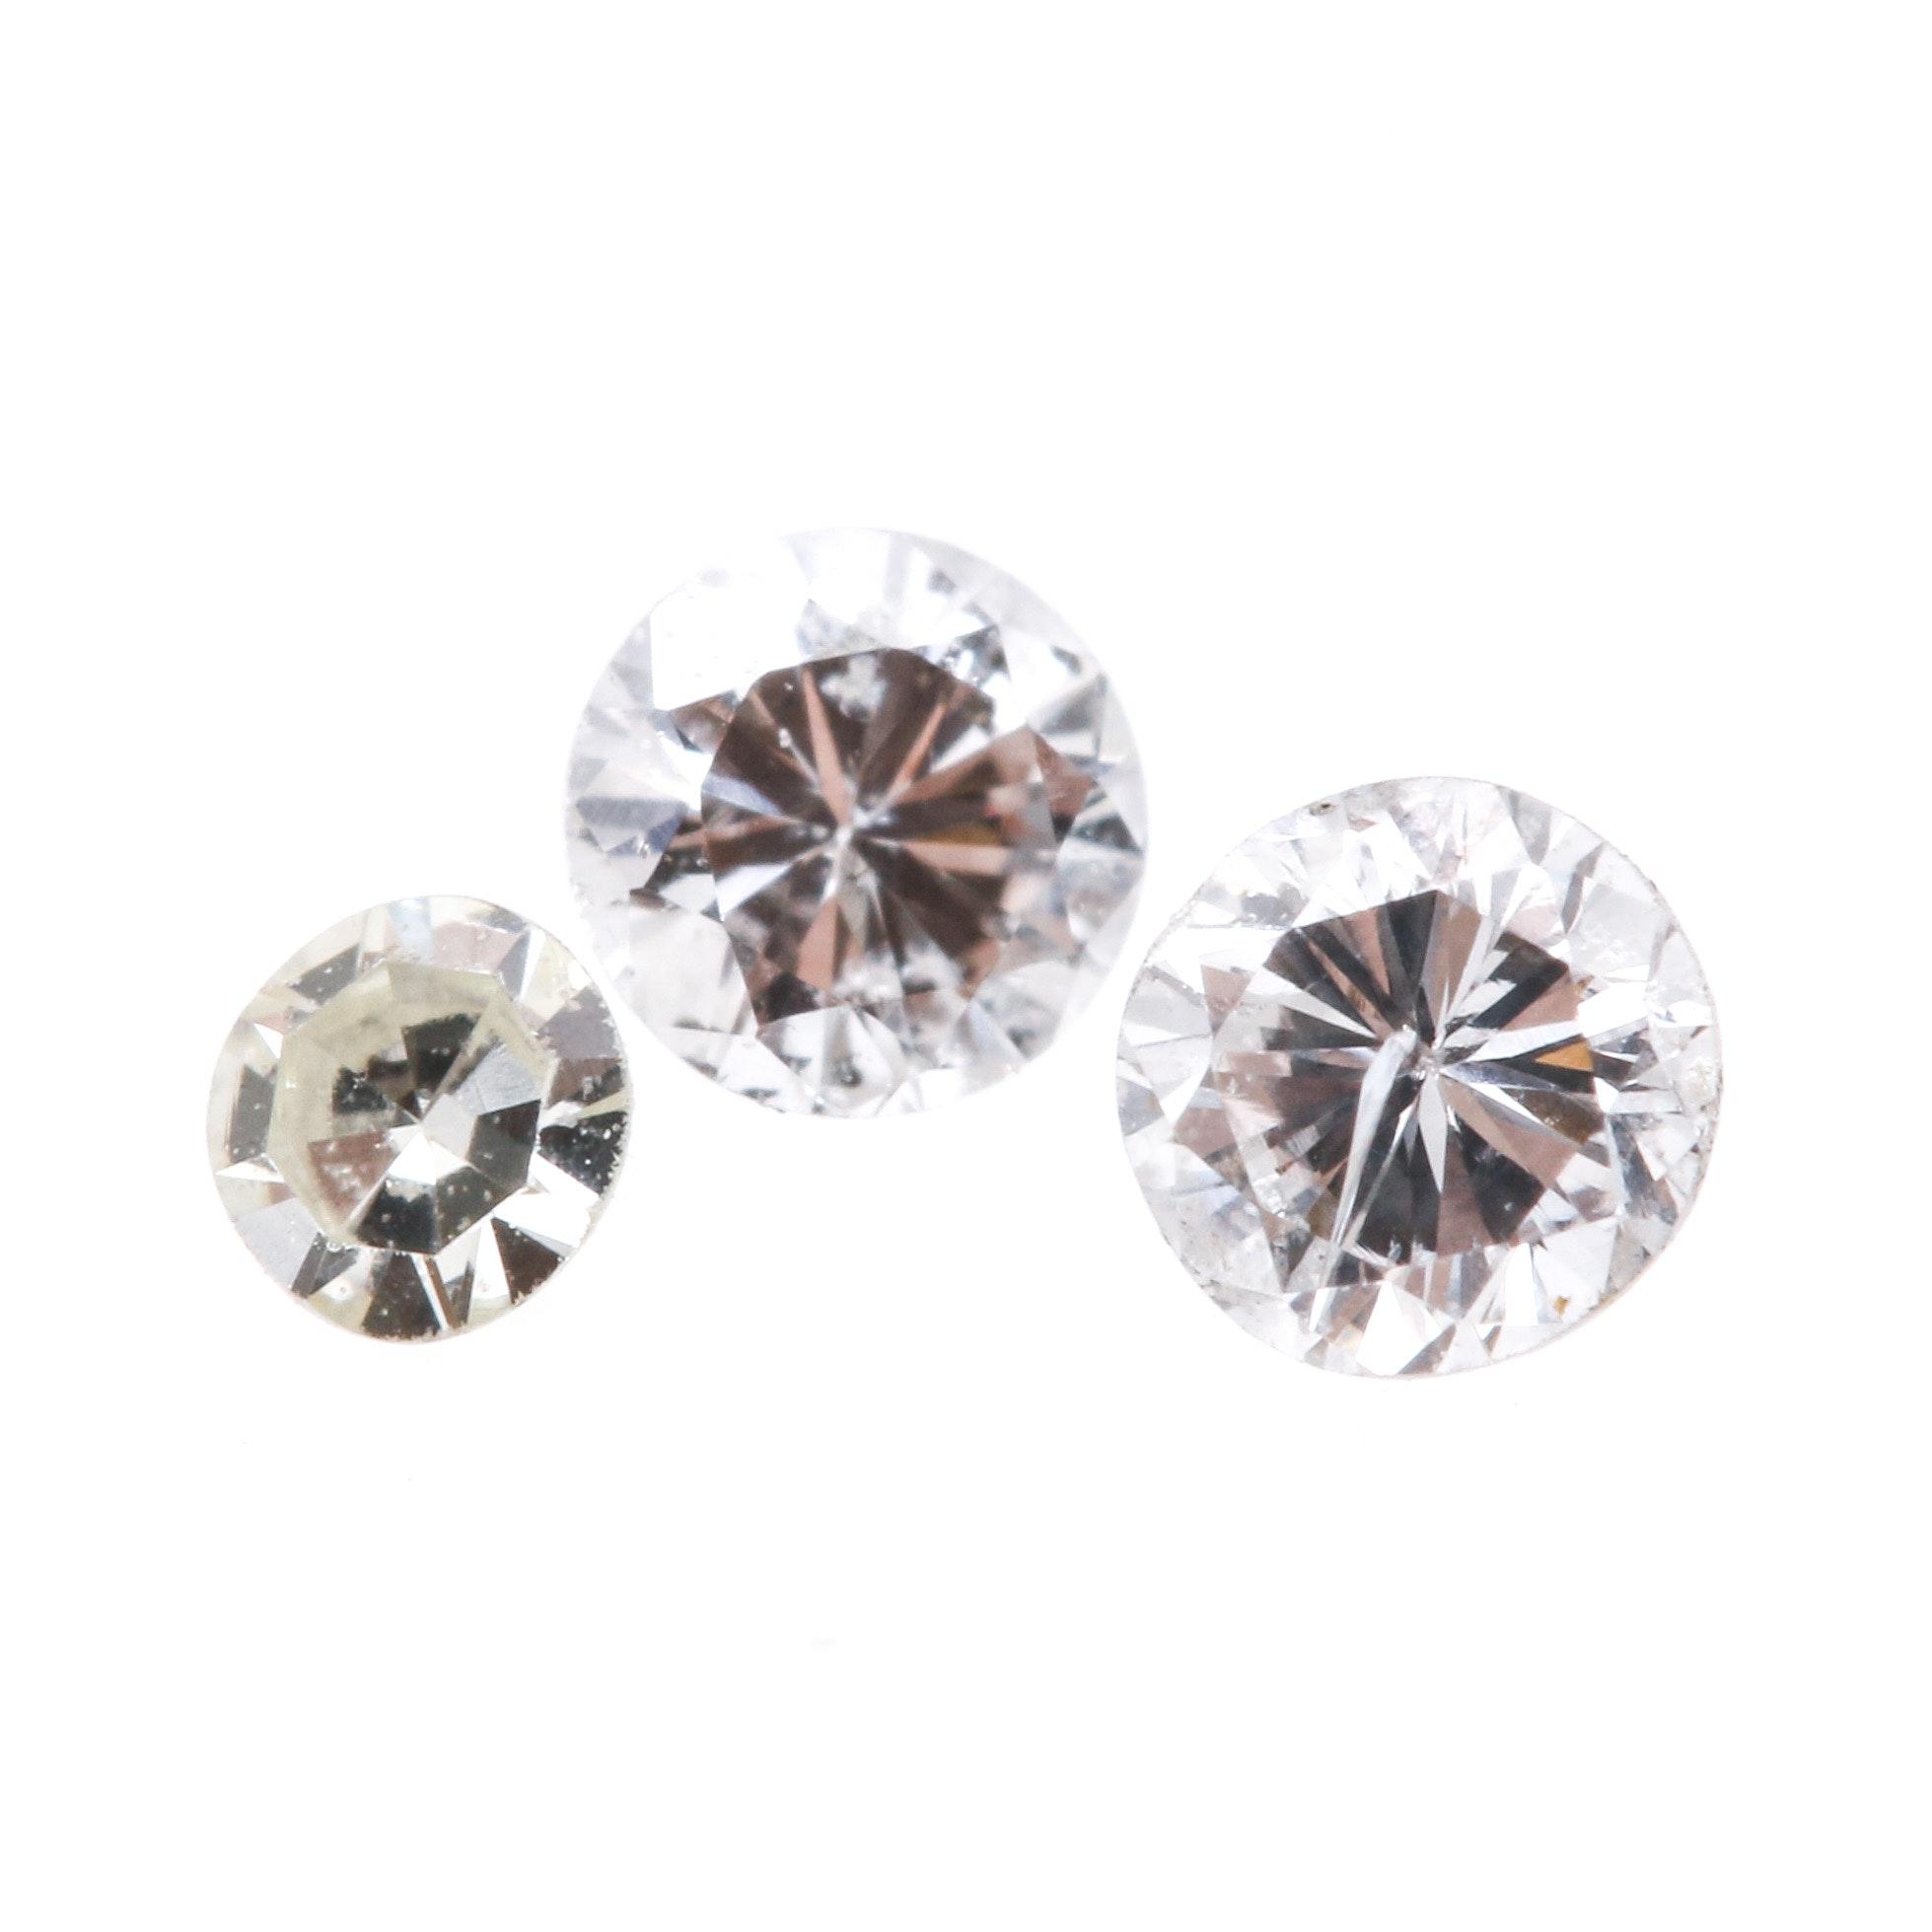 Assortment of Loose Diamond Stones